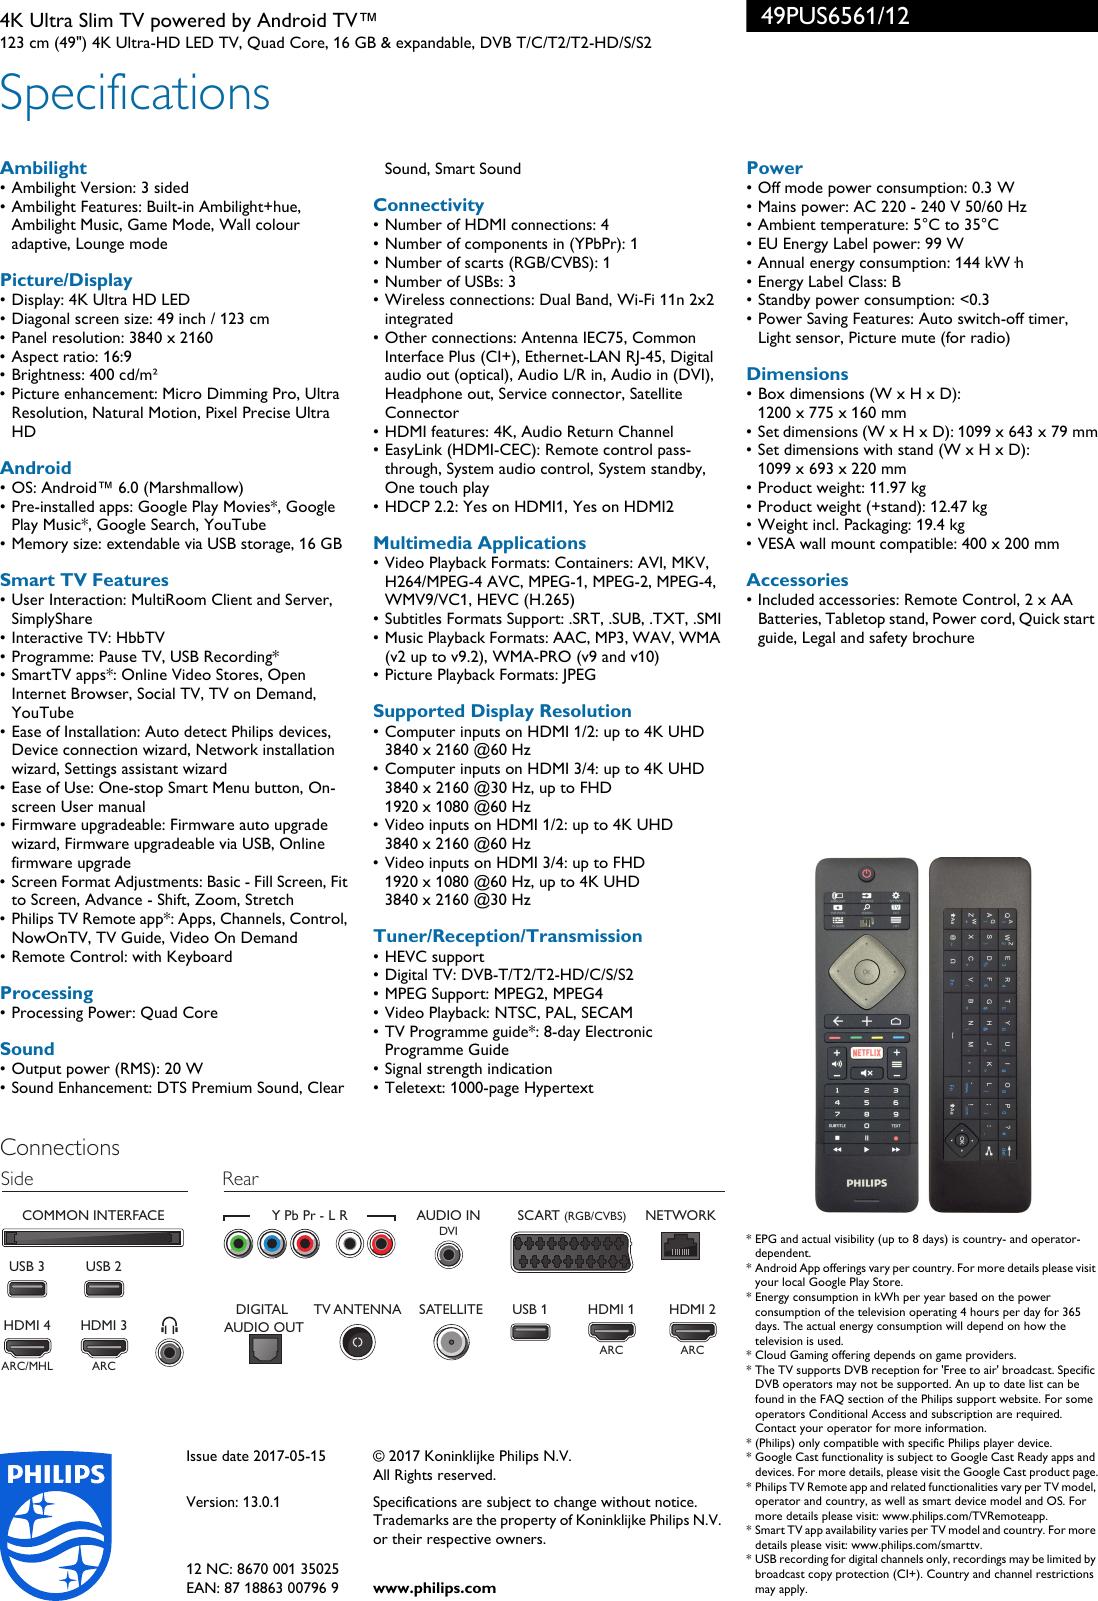 Philips 49PUS6561/12 Leaflet 49PUS6561_12 Released United